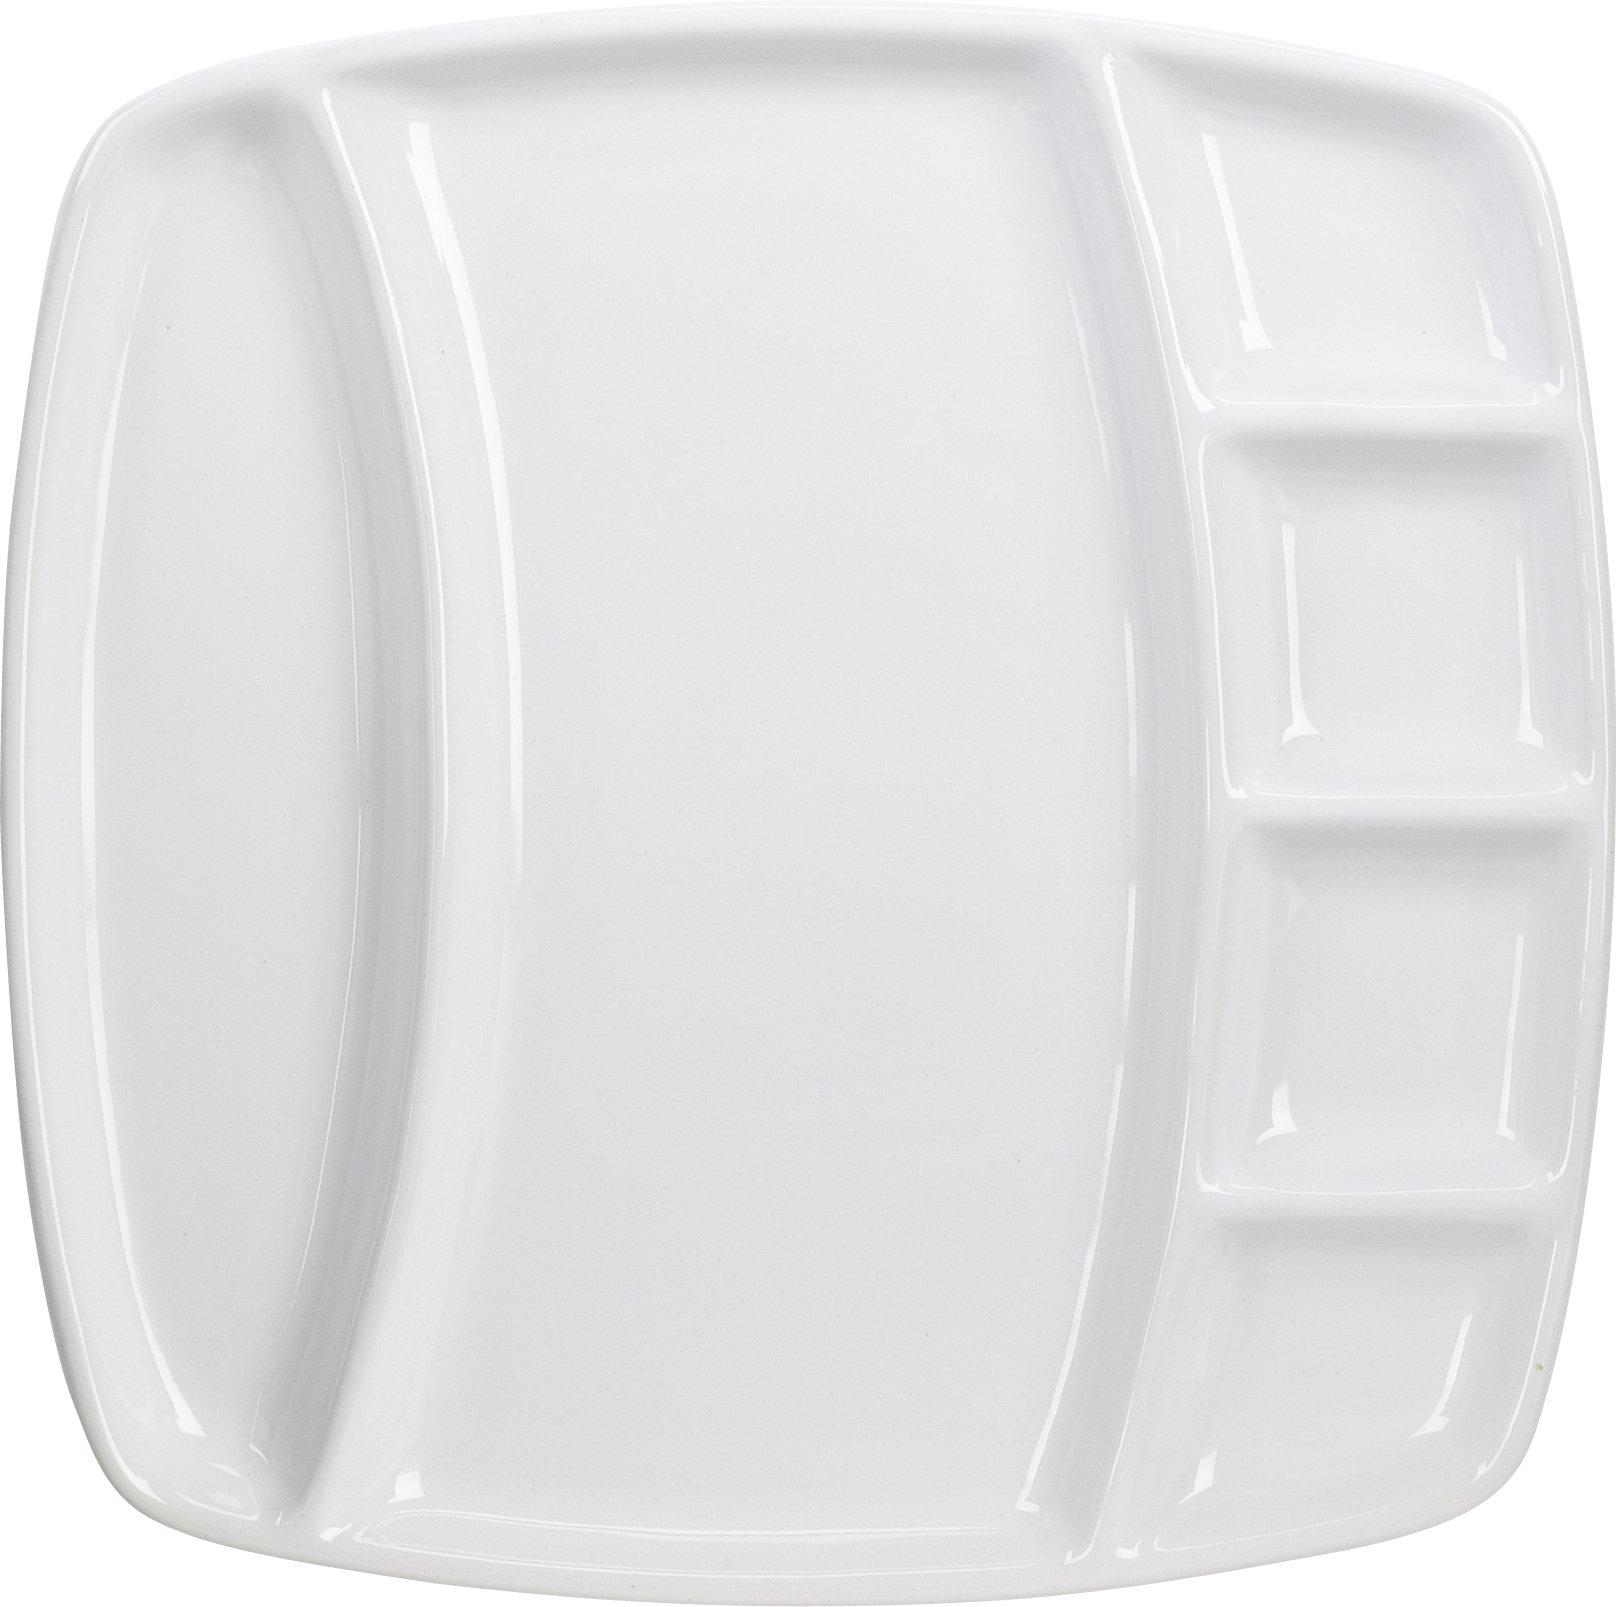 4-Piece Square Fondue Plates-Home Presence